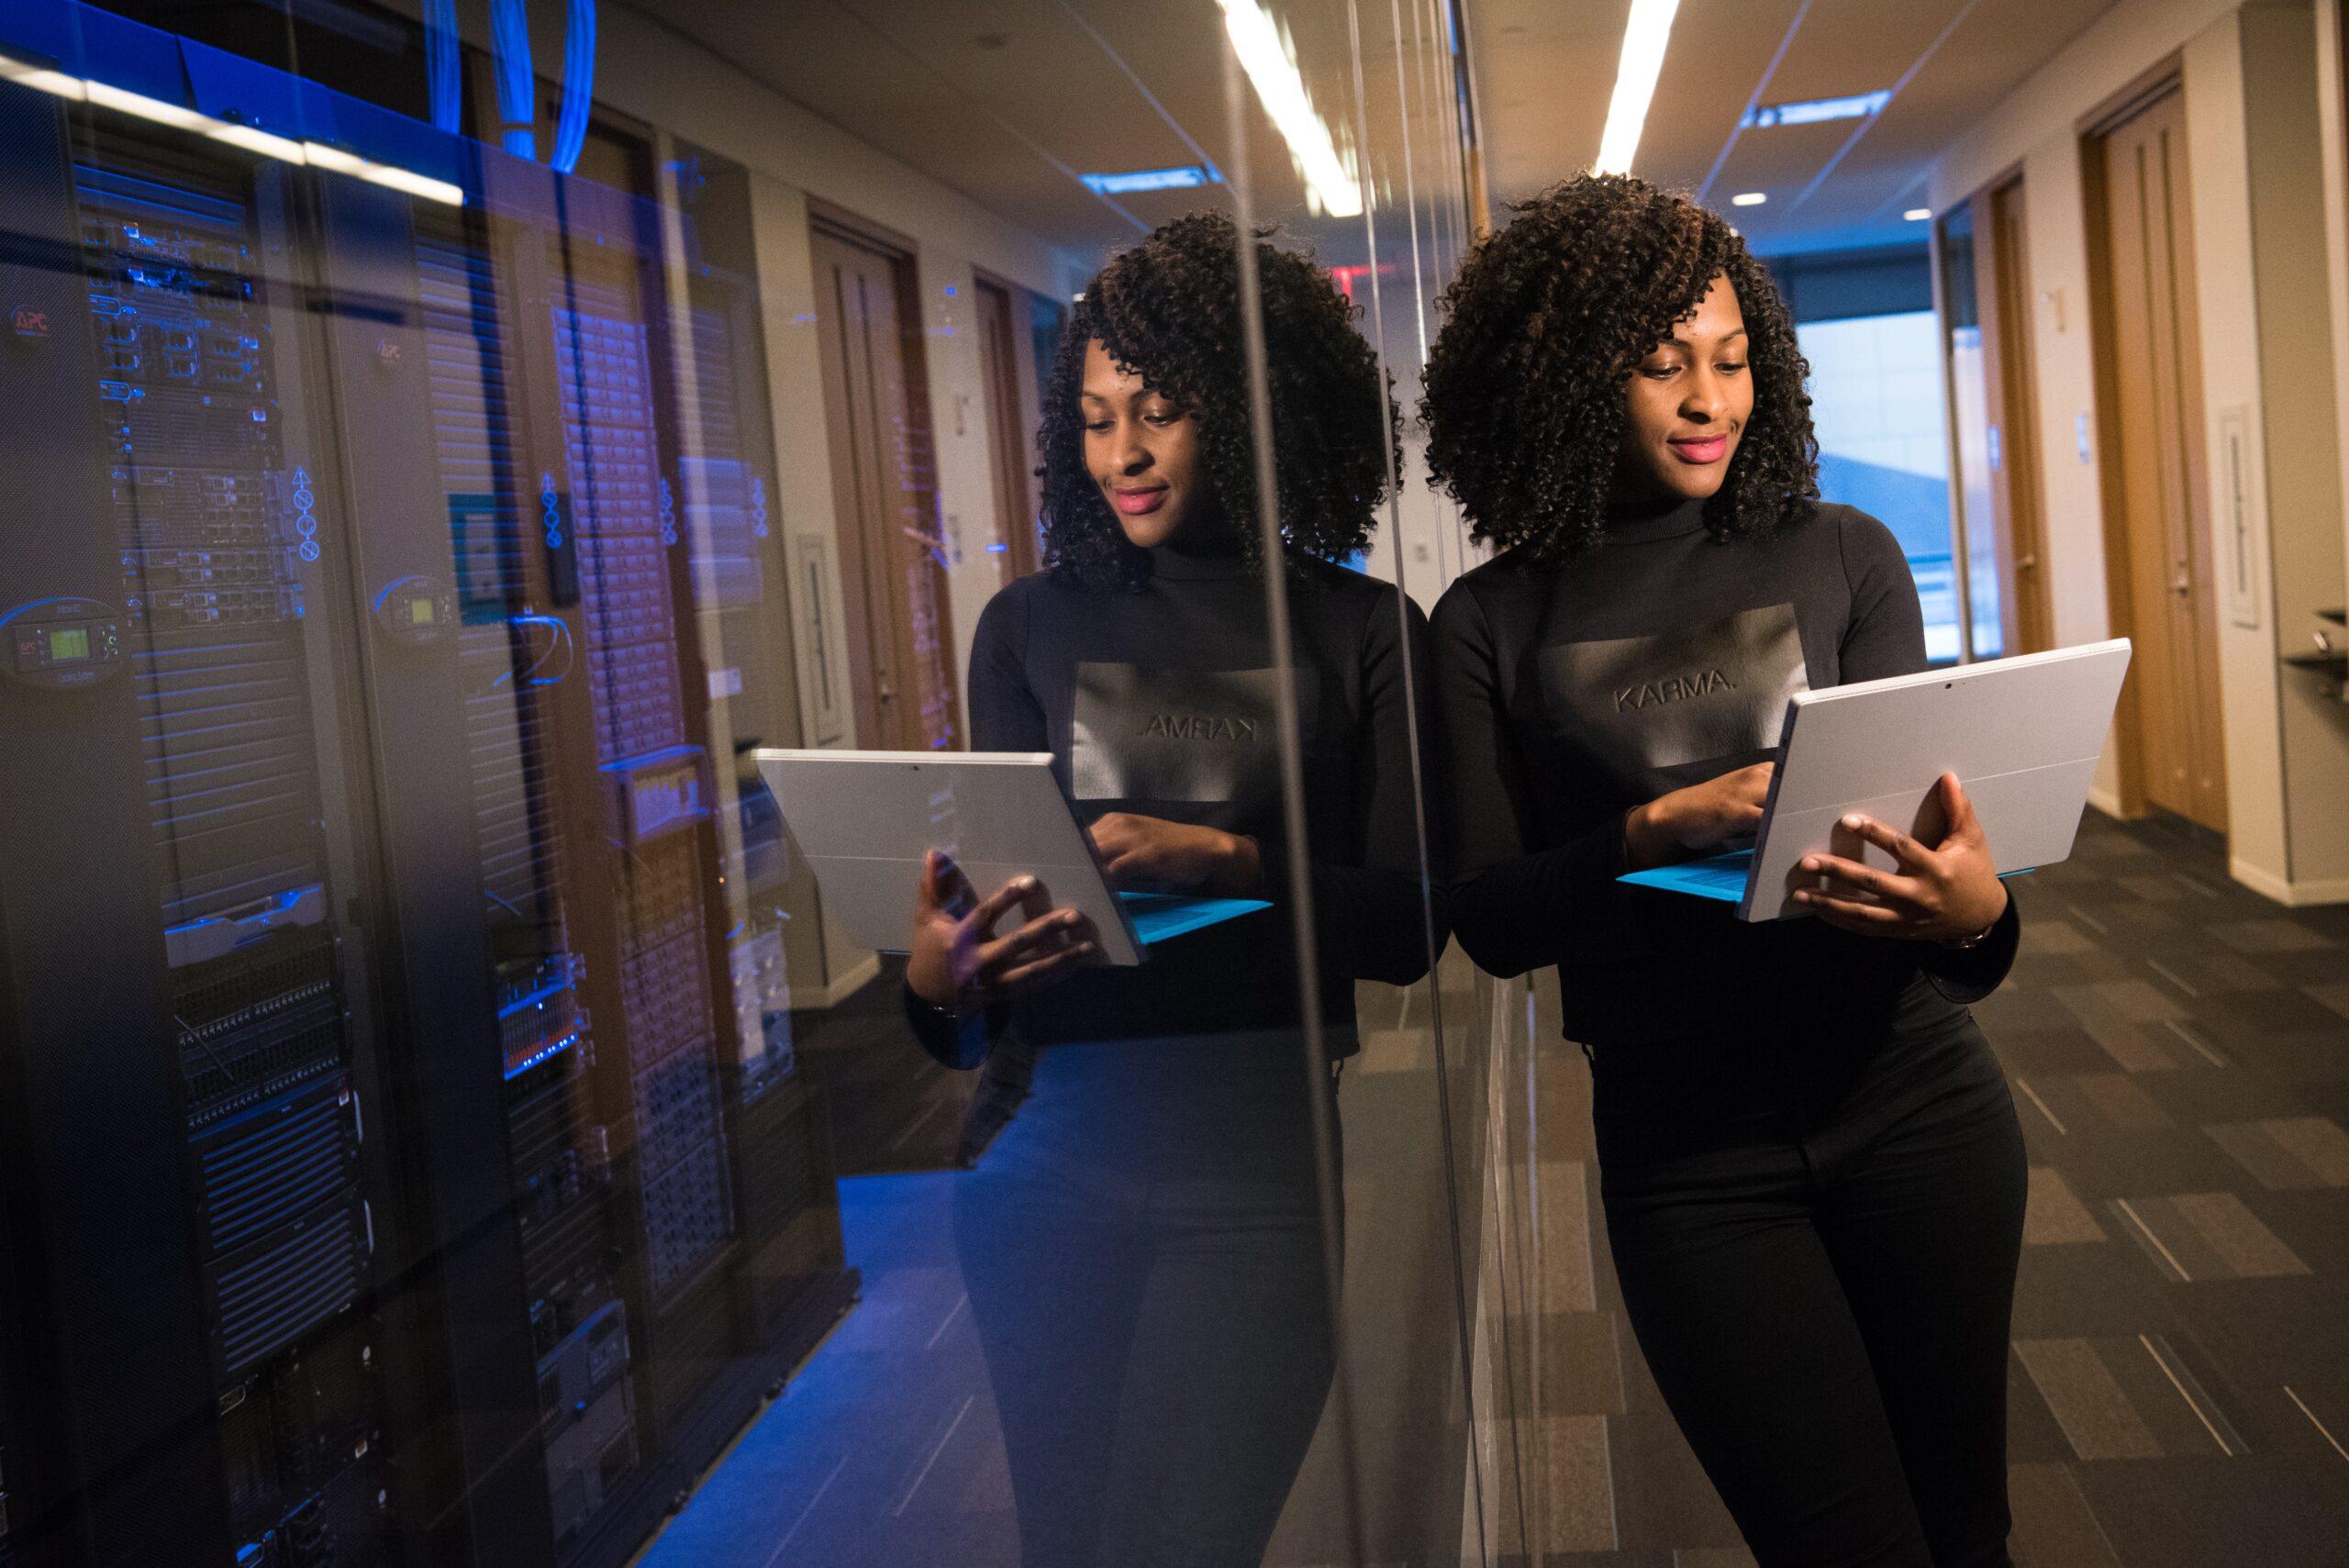 Female data analyst leaning against glass